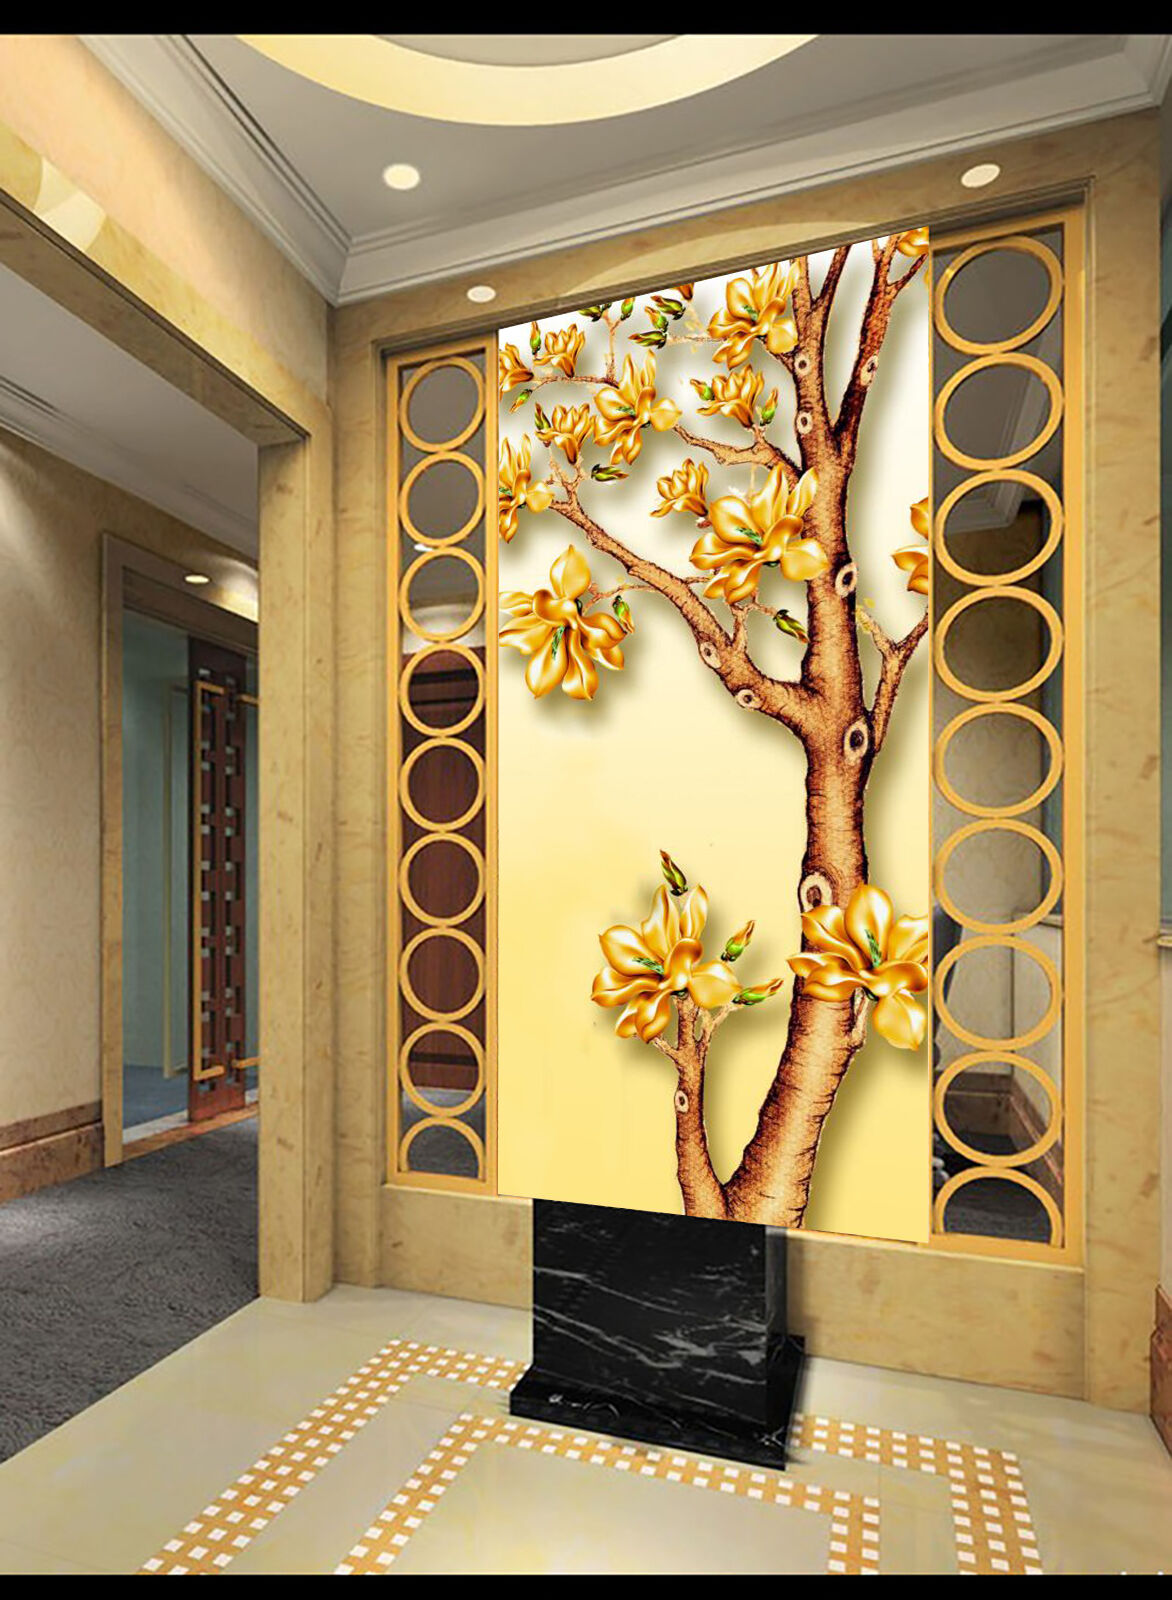 3D Goldene Bäume Fototapeten Wandbild Fototapete Bild Tapete Familie Kinder Kinder Kinder | Shopping Online  | Garantiere Qualität und Quantität  | Deutschland Online Shop  4bda26